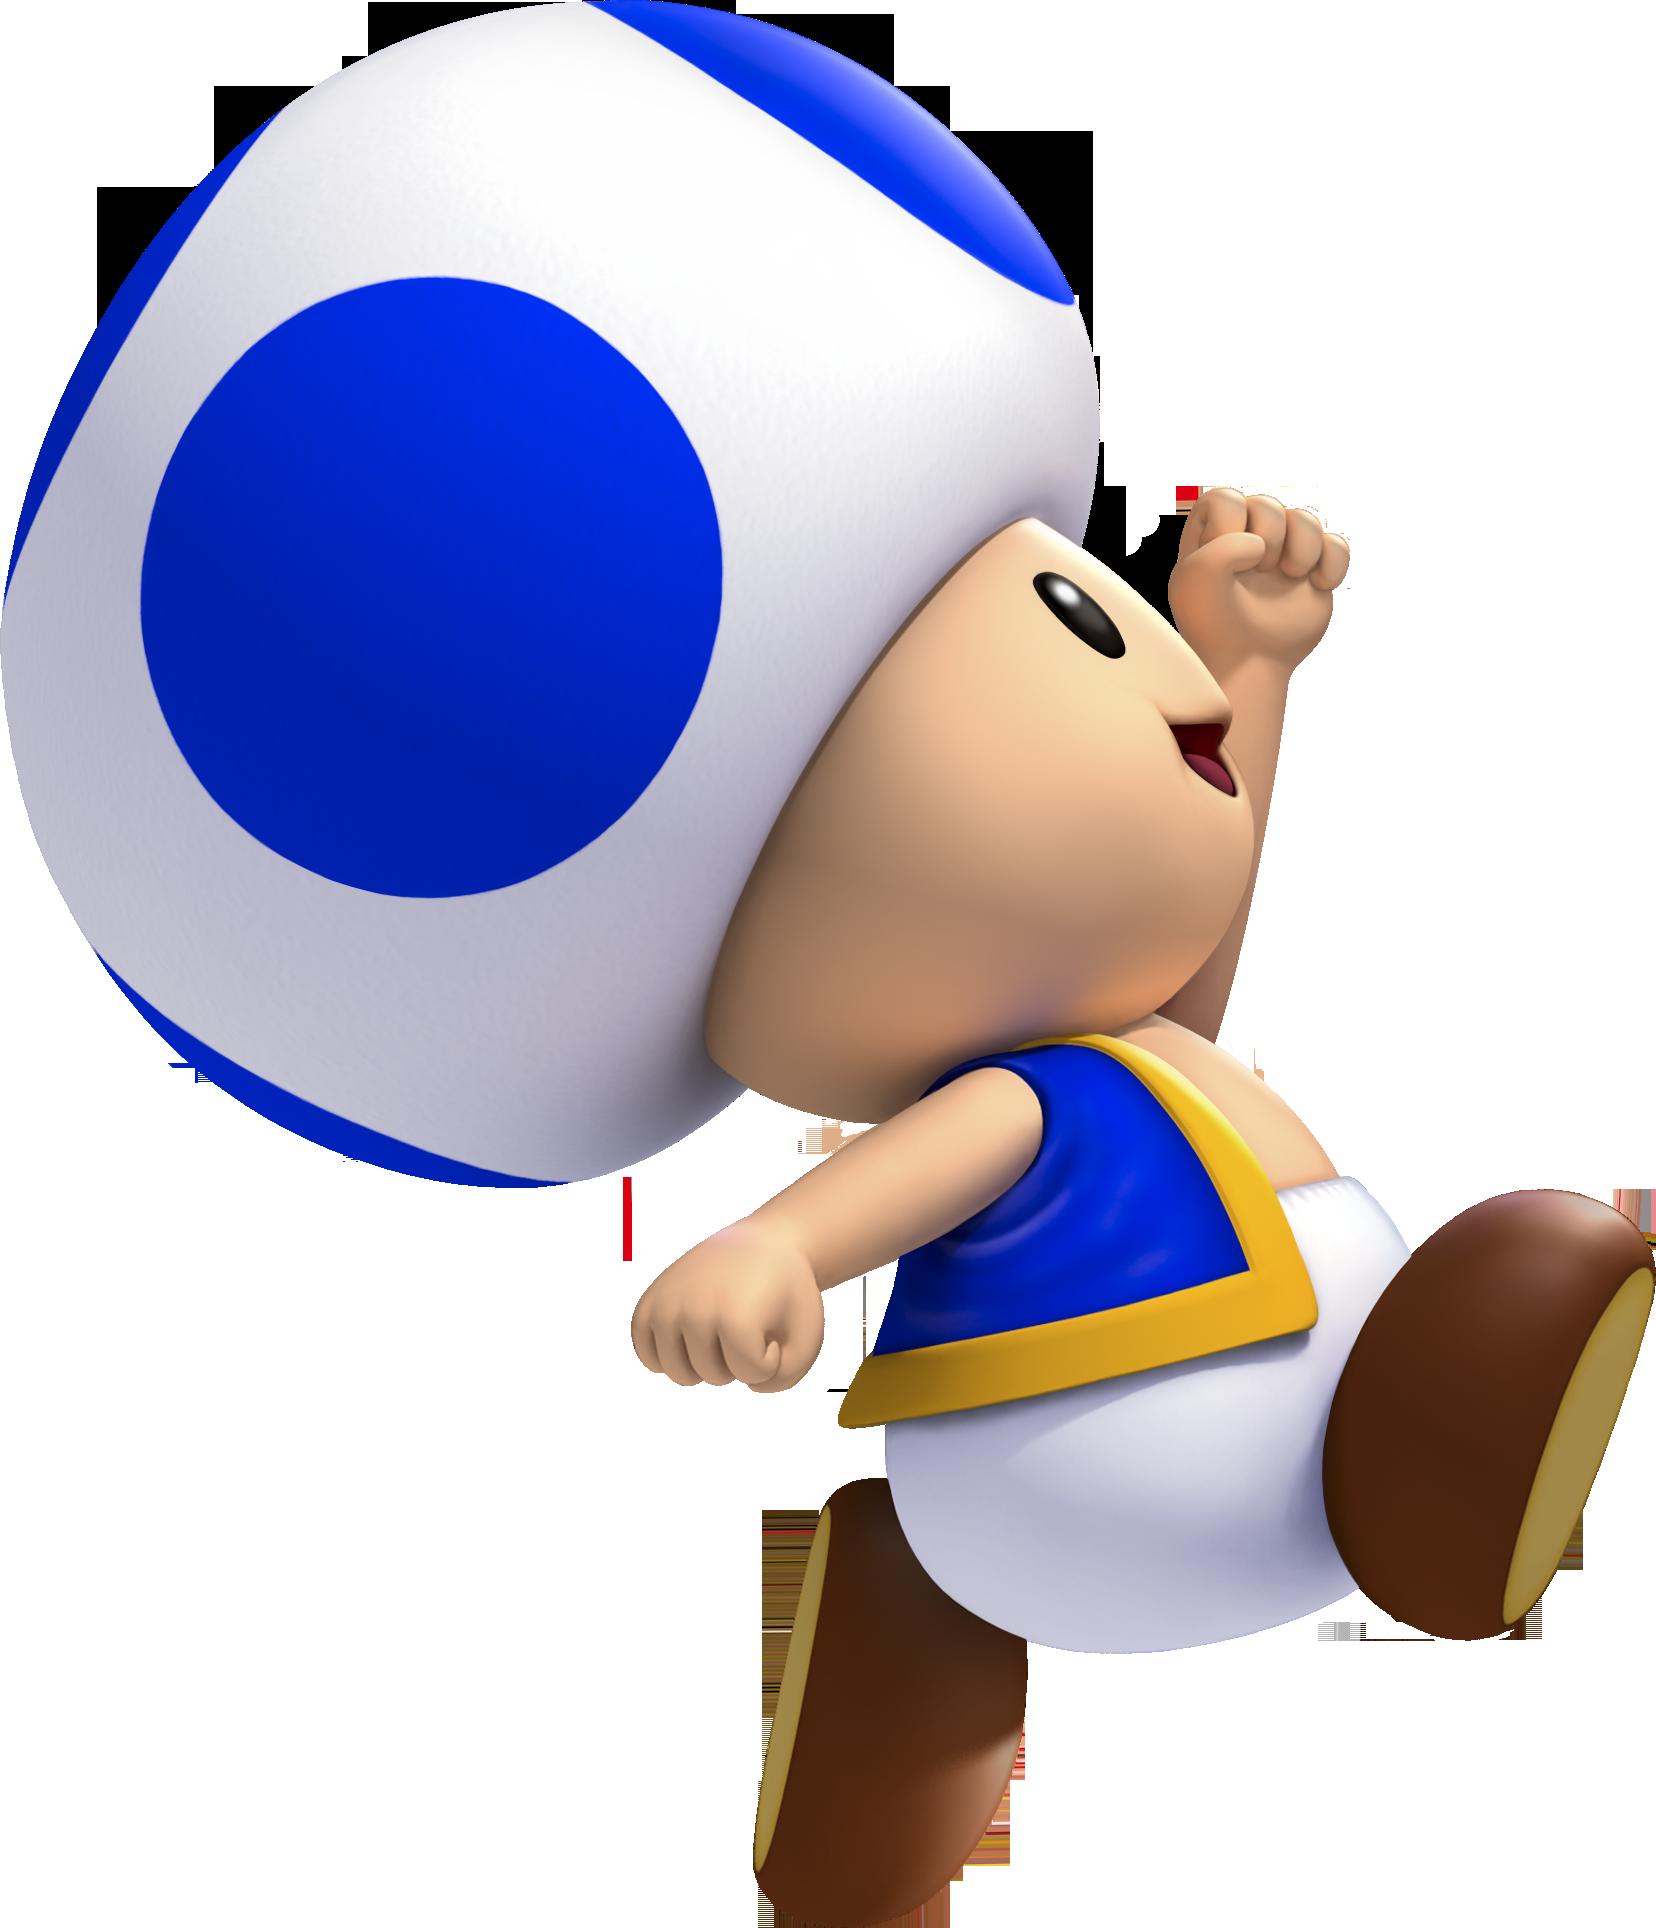 Star swoop clipart vector freeuse download Super Mario All-Star Bros. | Fantendo - Nintendo Fanon Wiki | FANDOM ... vector freeuse download